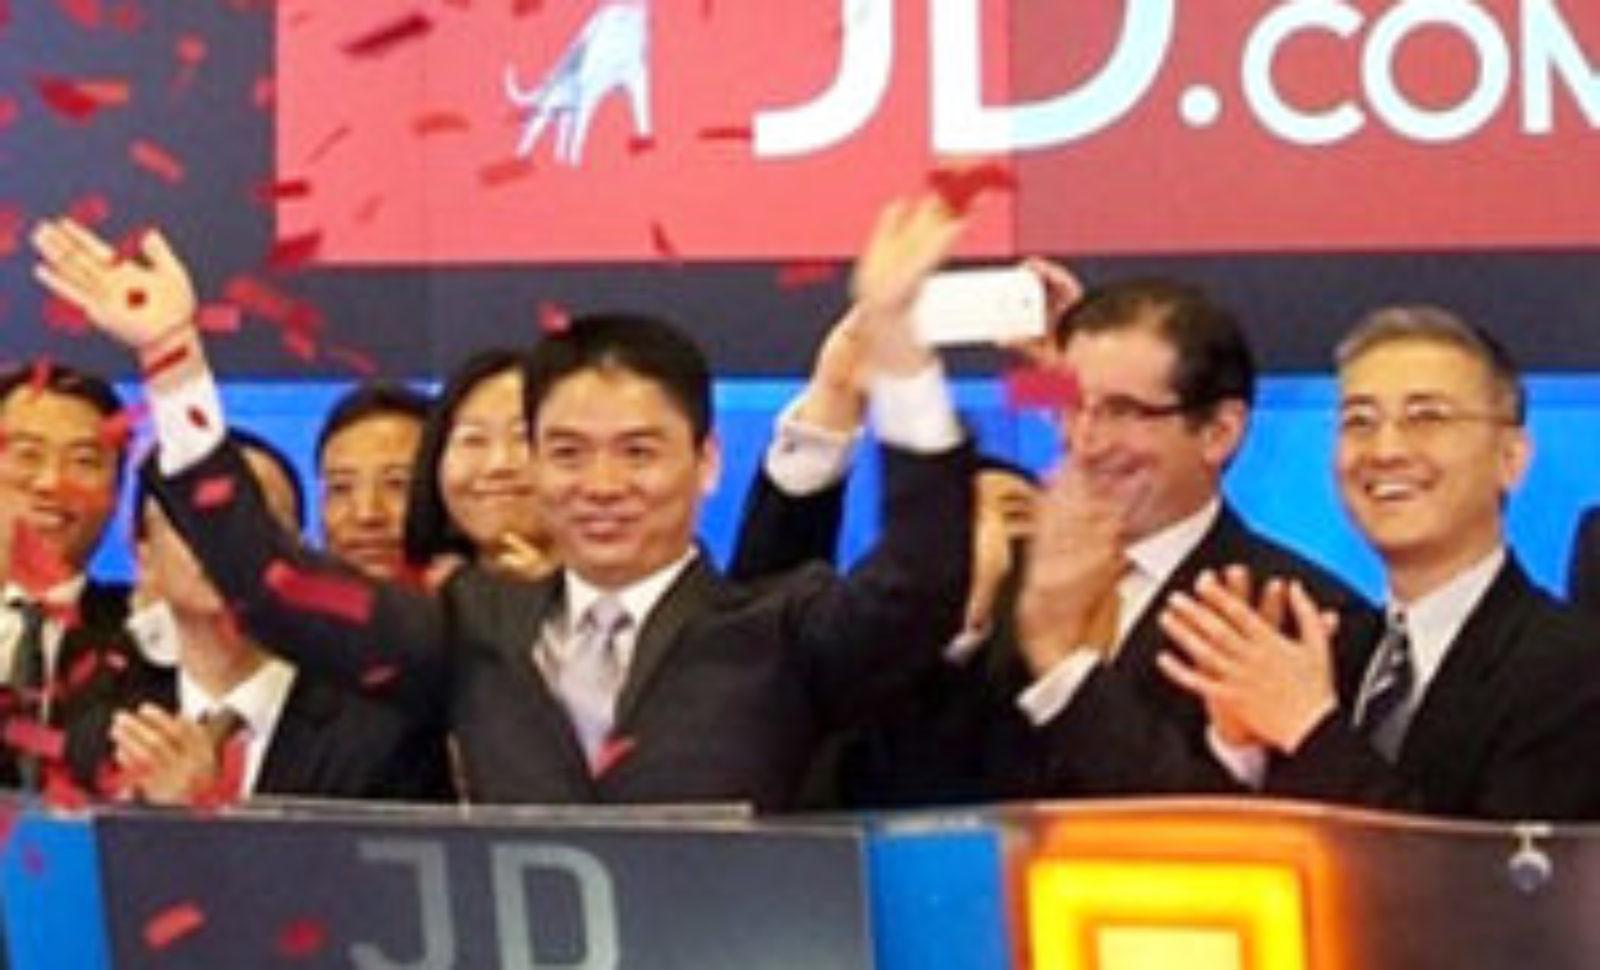 JD.com raises $2.5bn to drive logistics growth